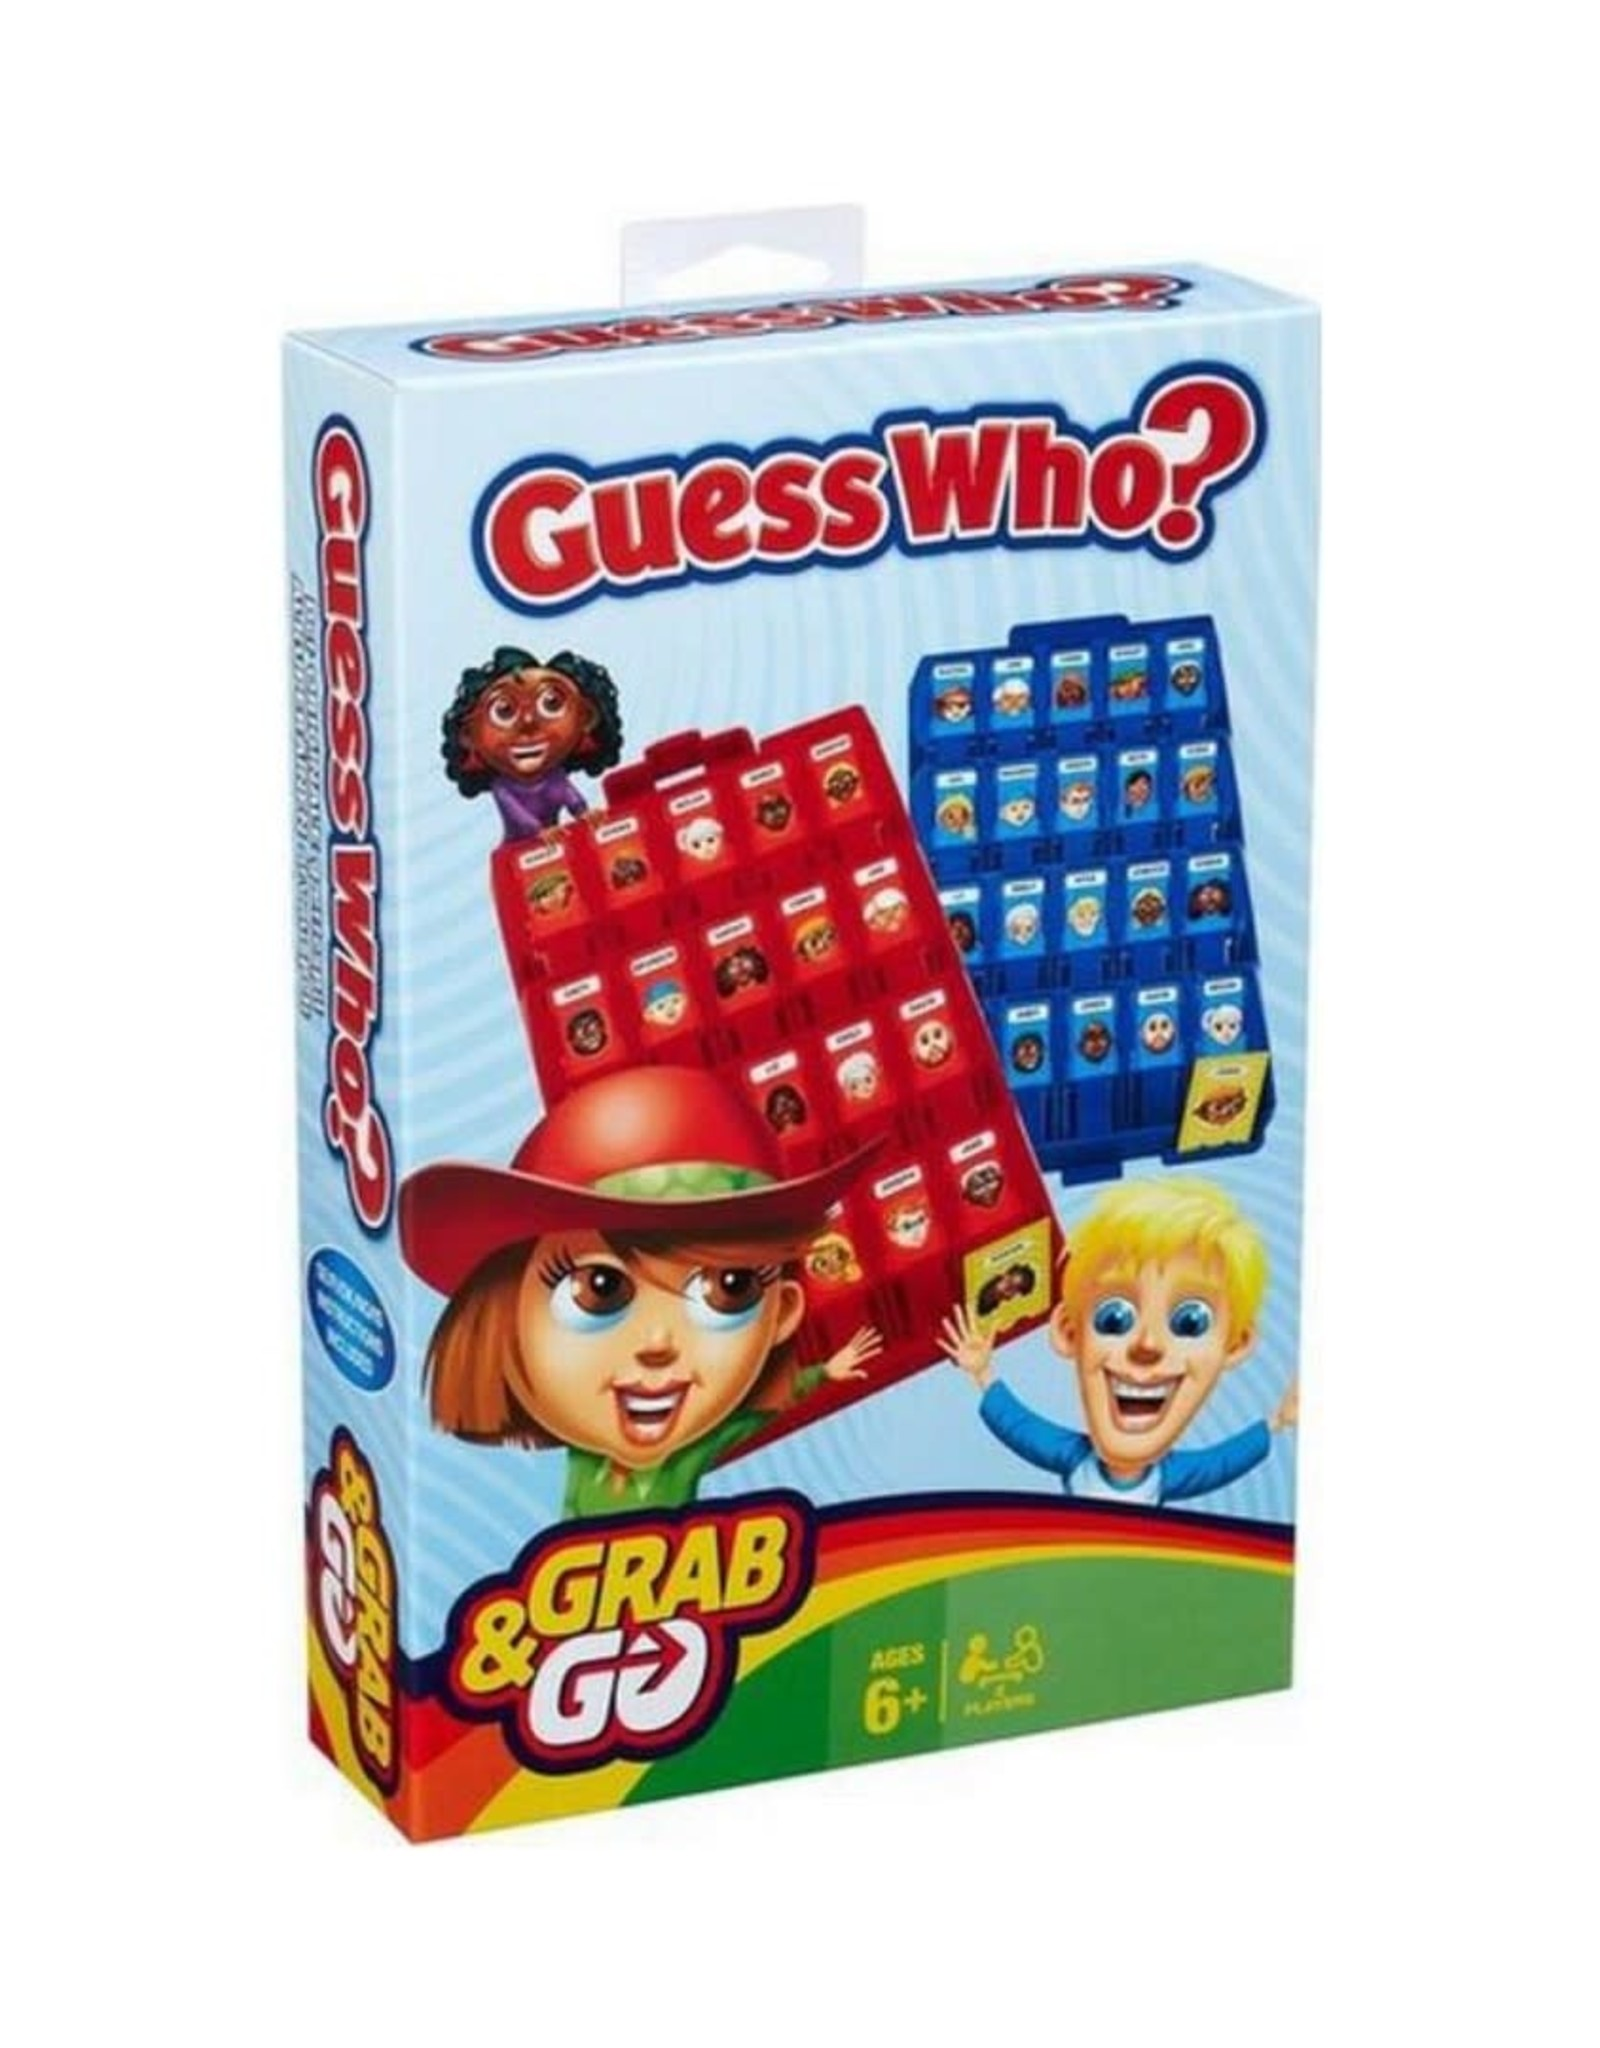 Hasbro Grab N Go Guess Who?